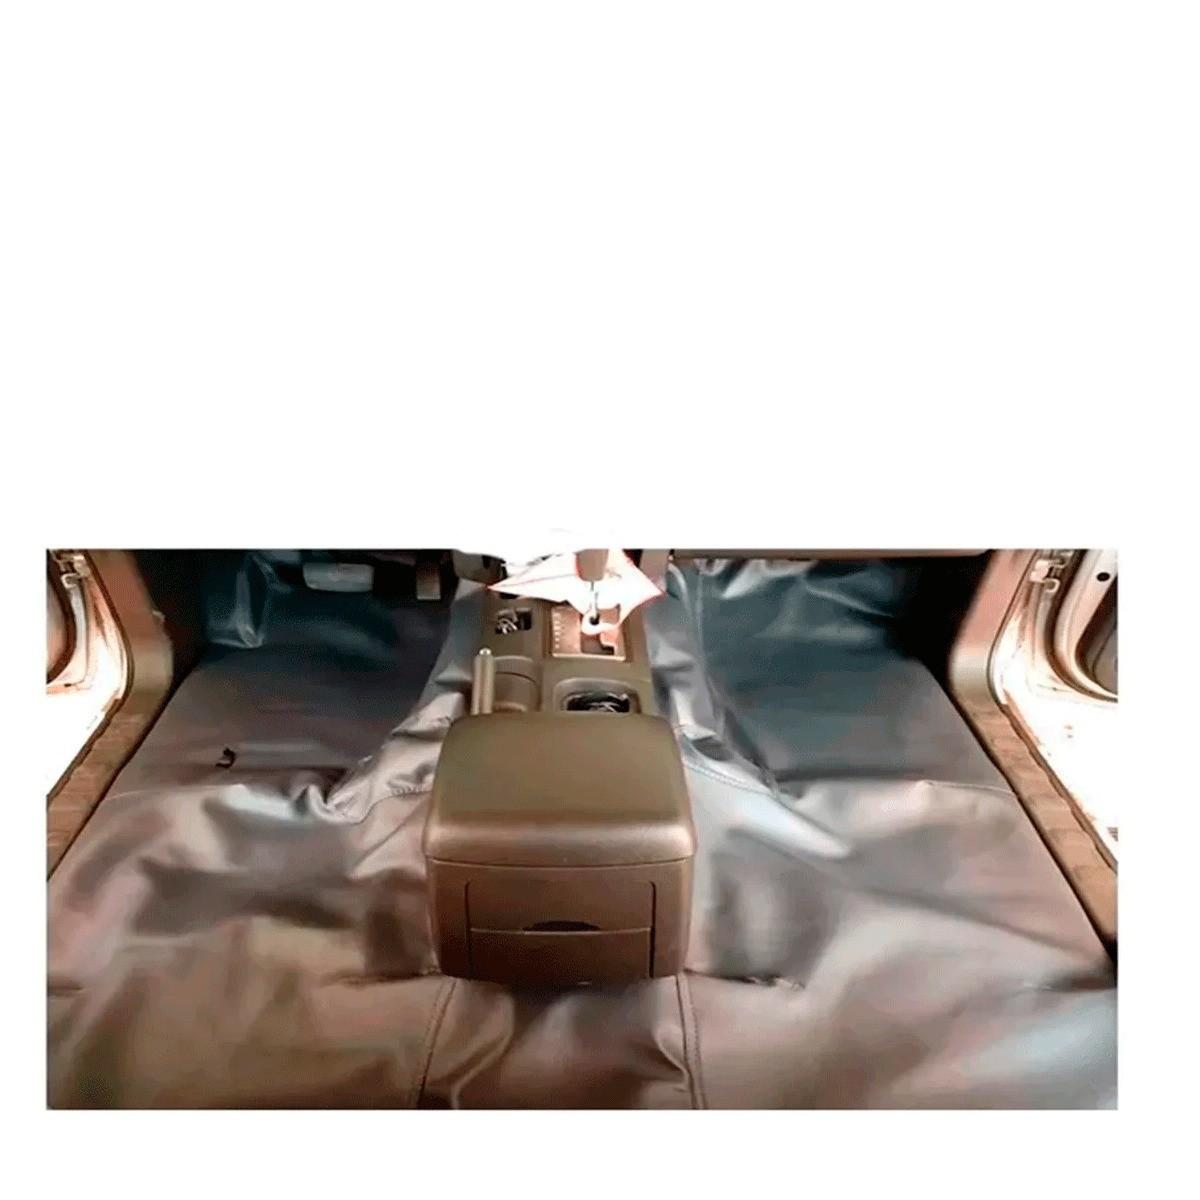 Tapete Automotivo Assoalho Emborrachado Bidim Fiat Uno 99 a 2003